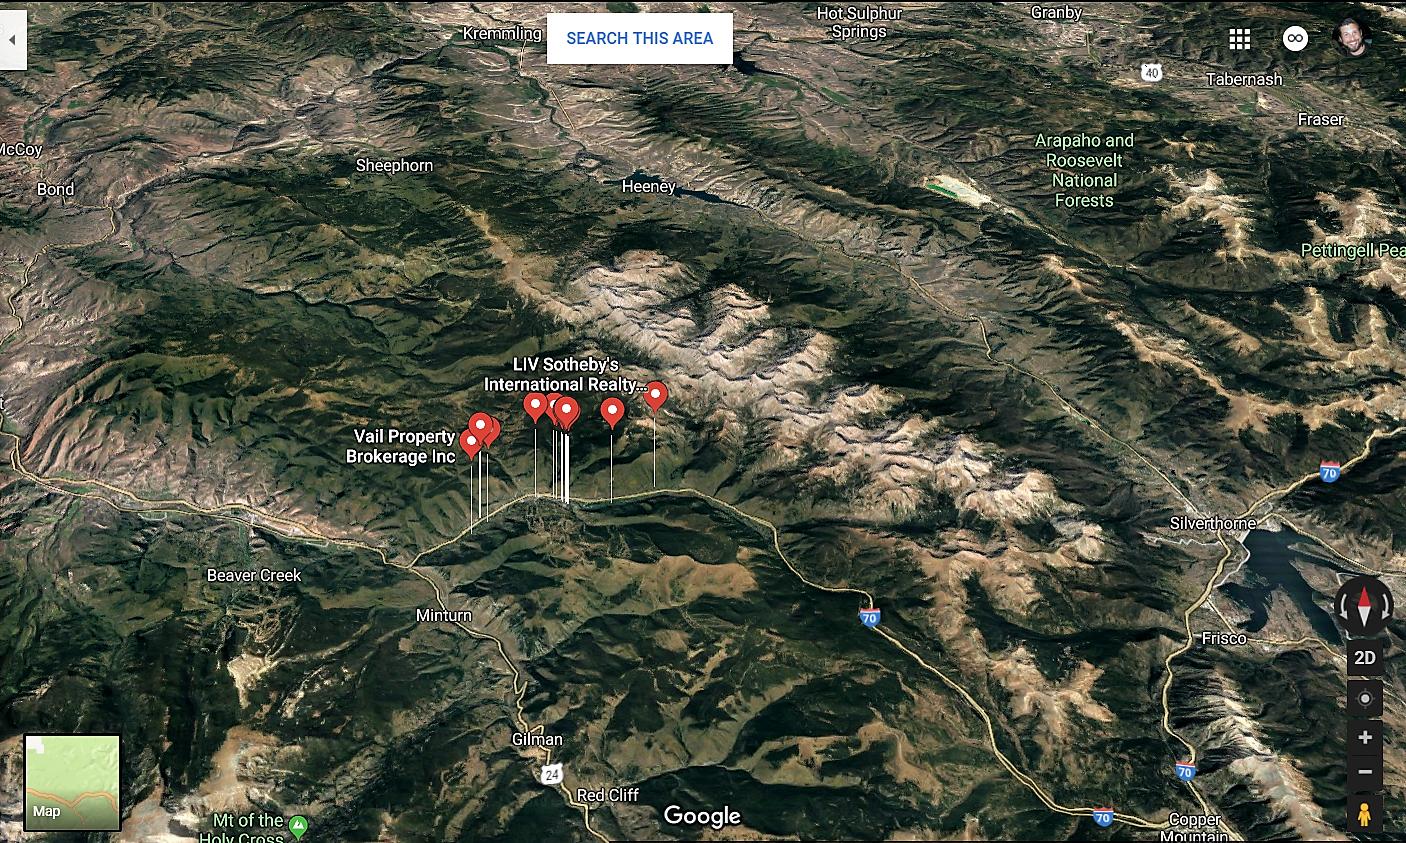 Rocky Mountain Vail Colorado Mortgage Loan Mountain Real Estate Dream Homes